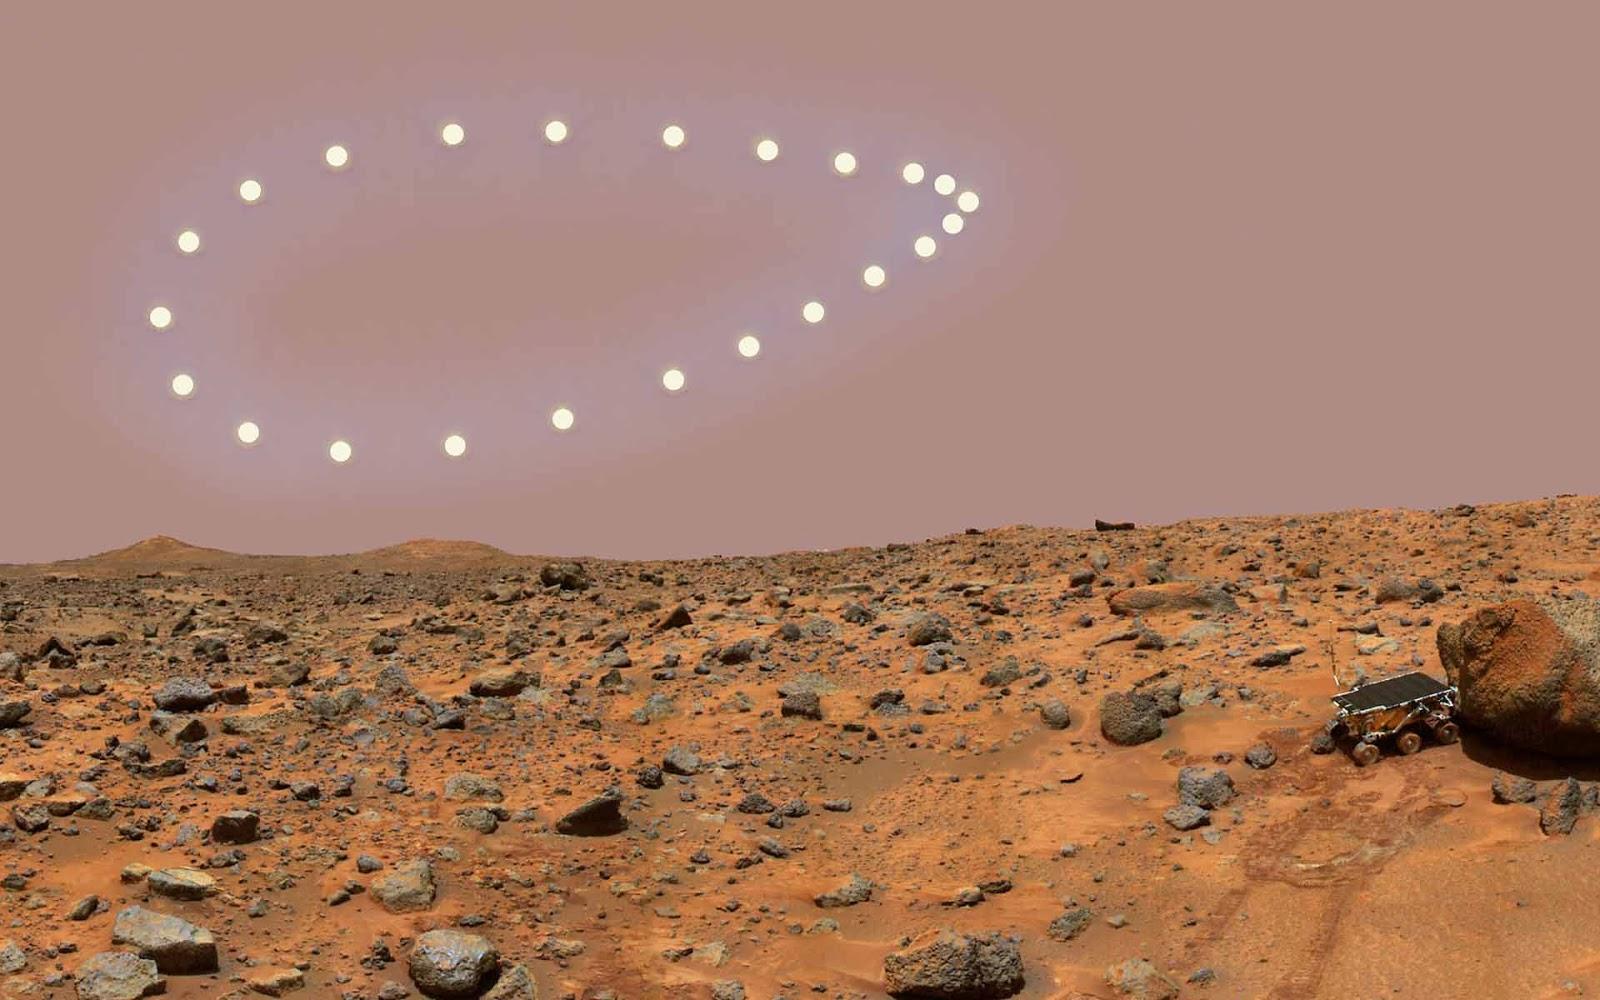 Mars Desktop Wallpaper.